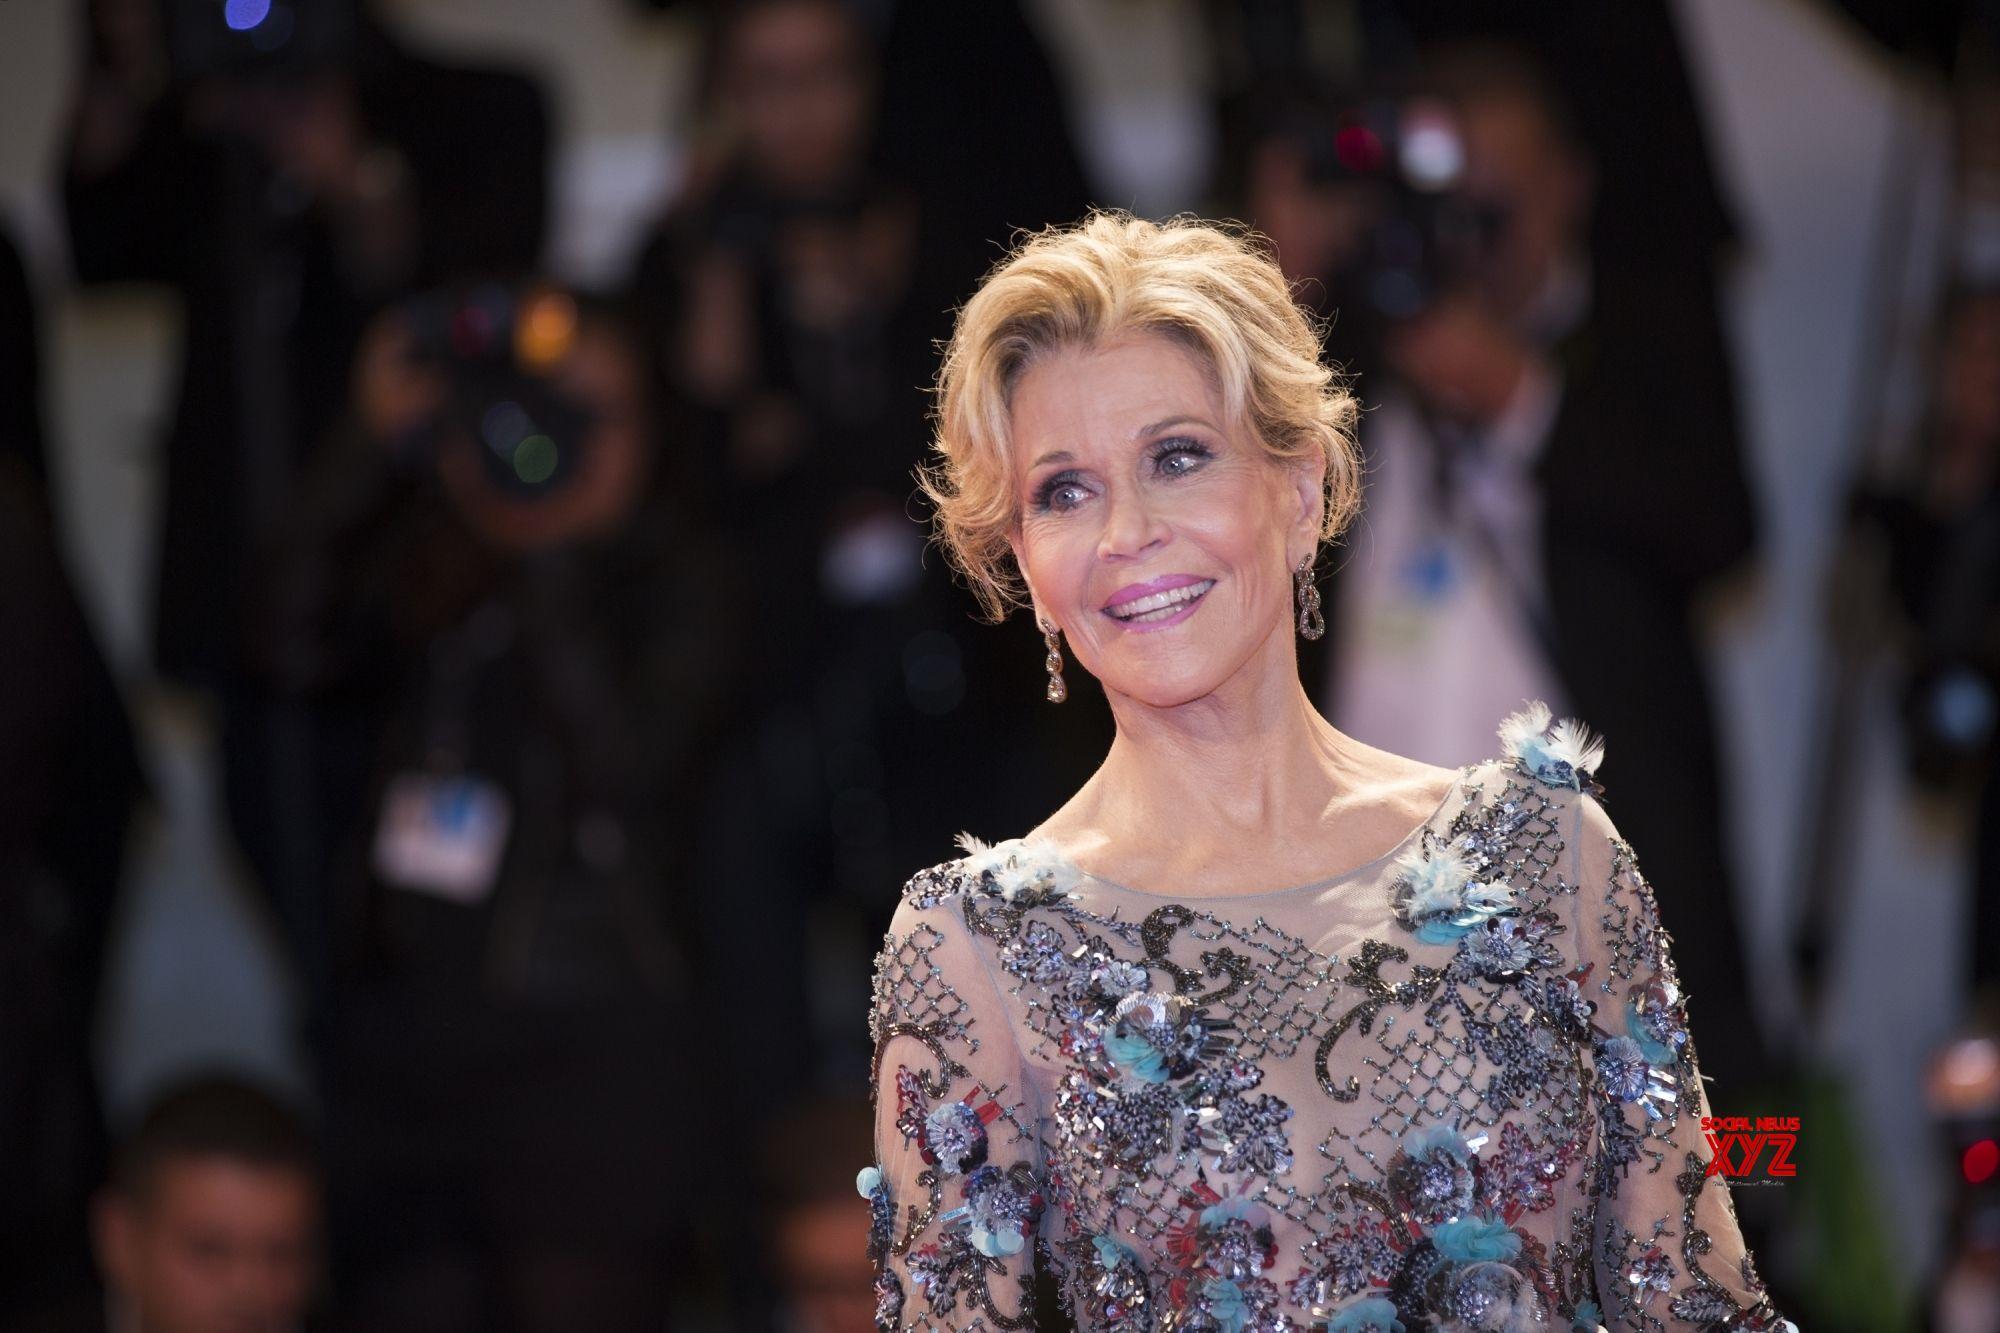 Jane Fonda to fight climate change virtually